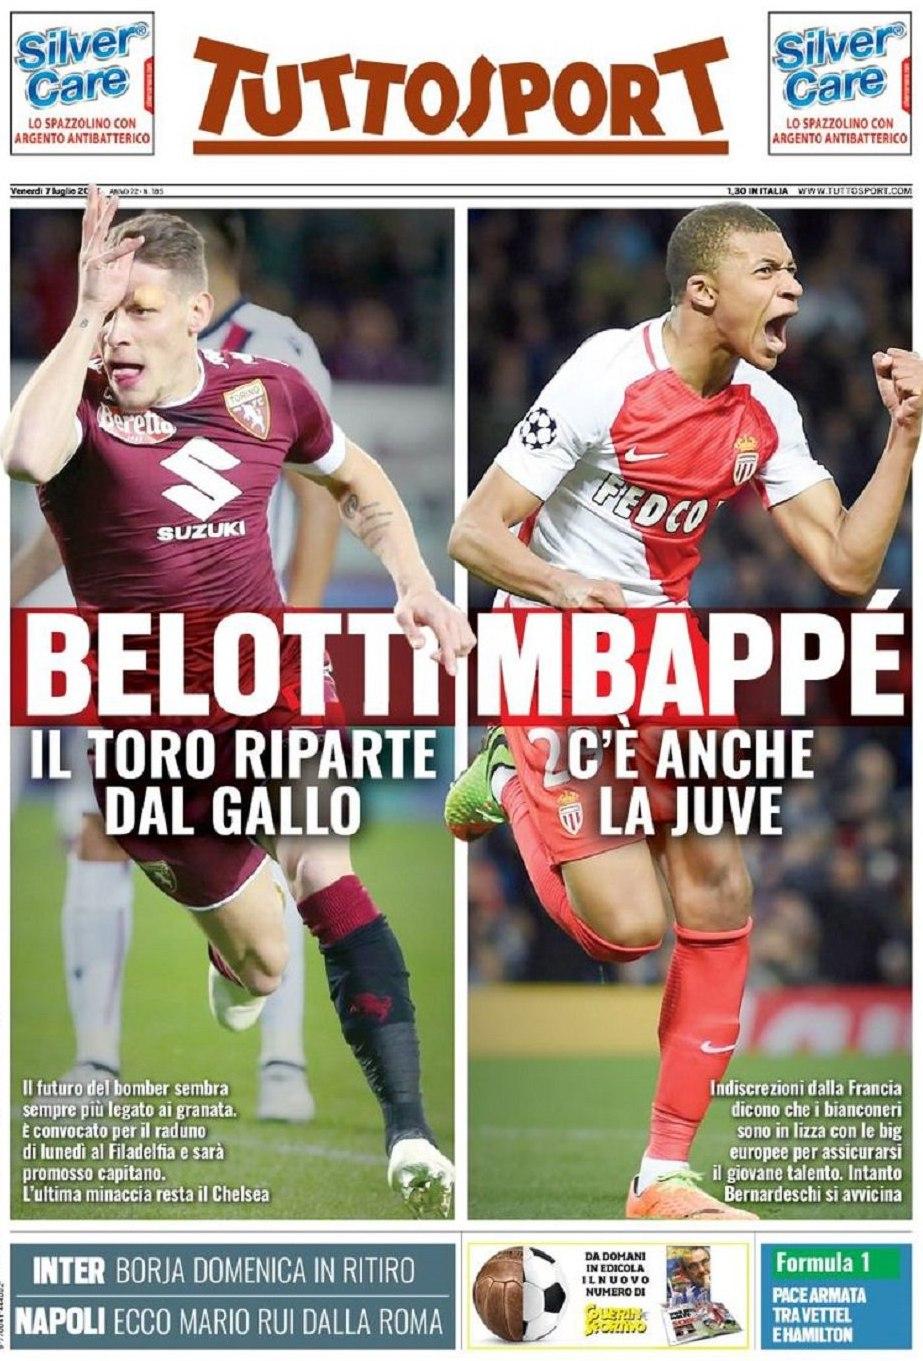 Tuttosport Belotti Mbappe